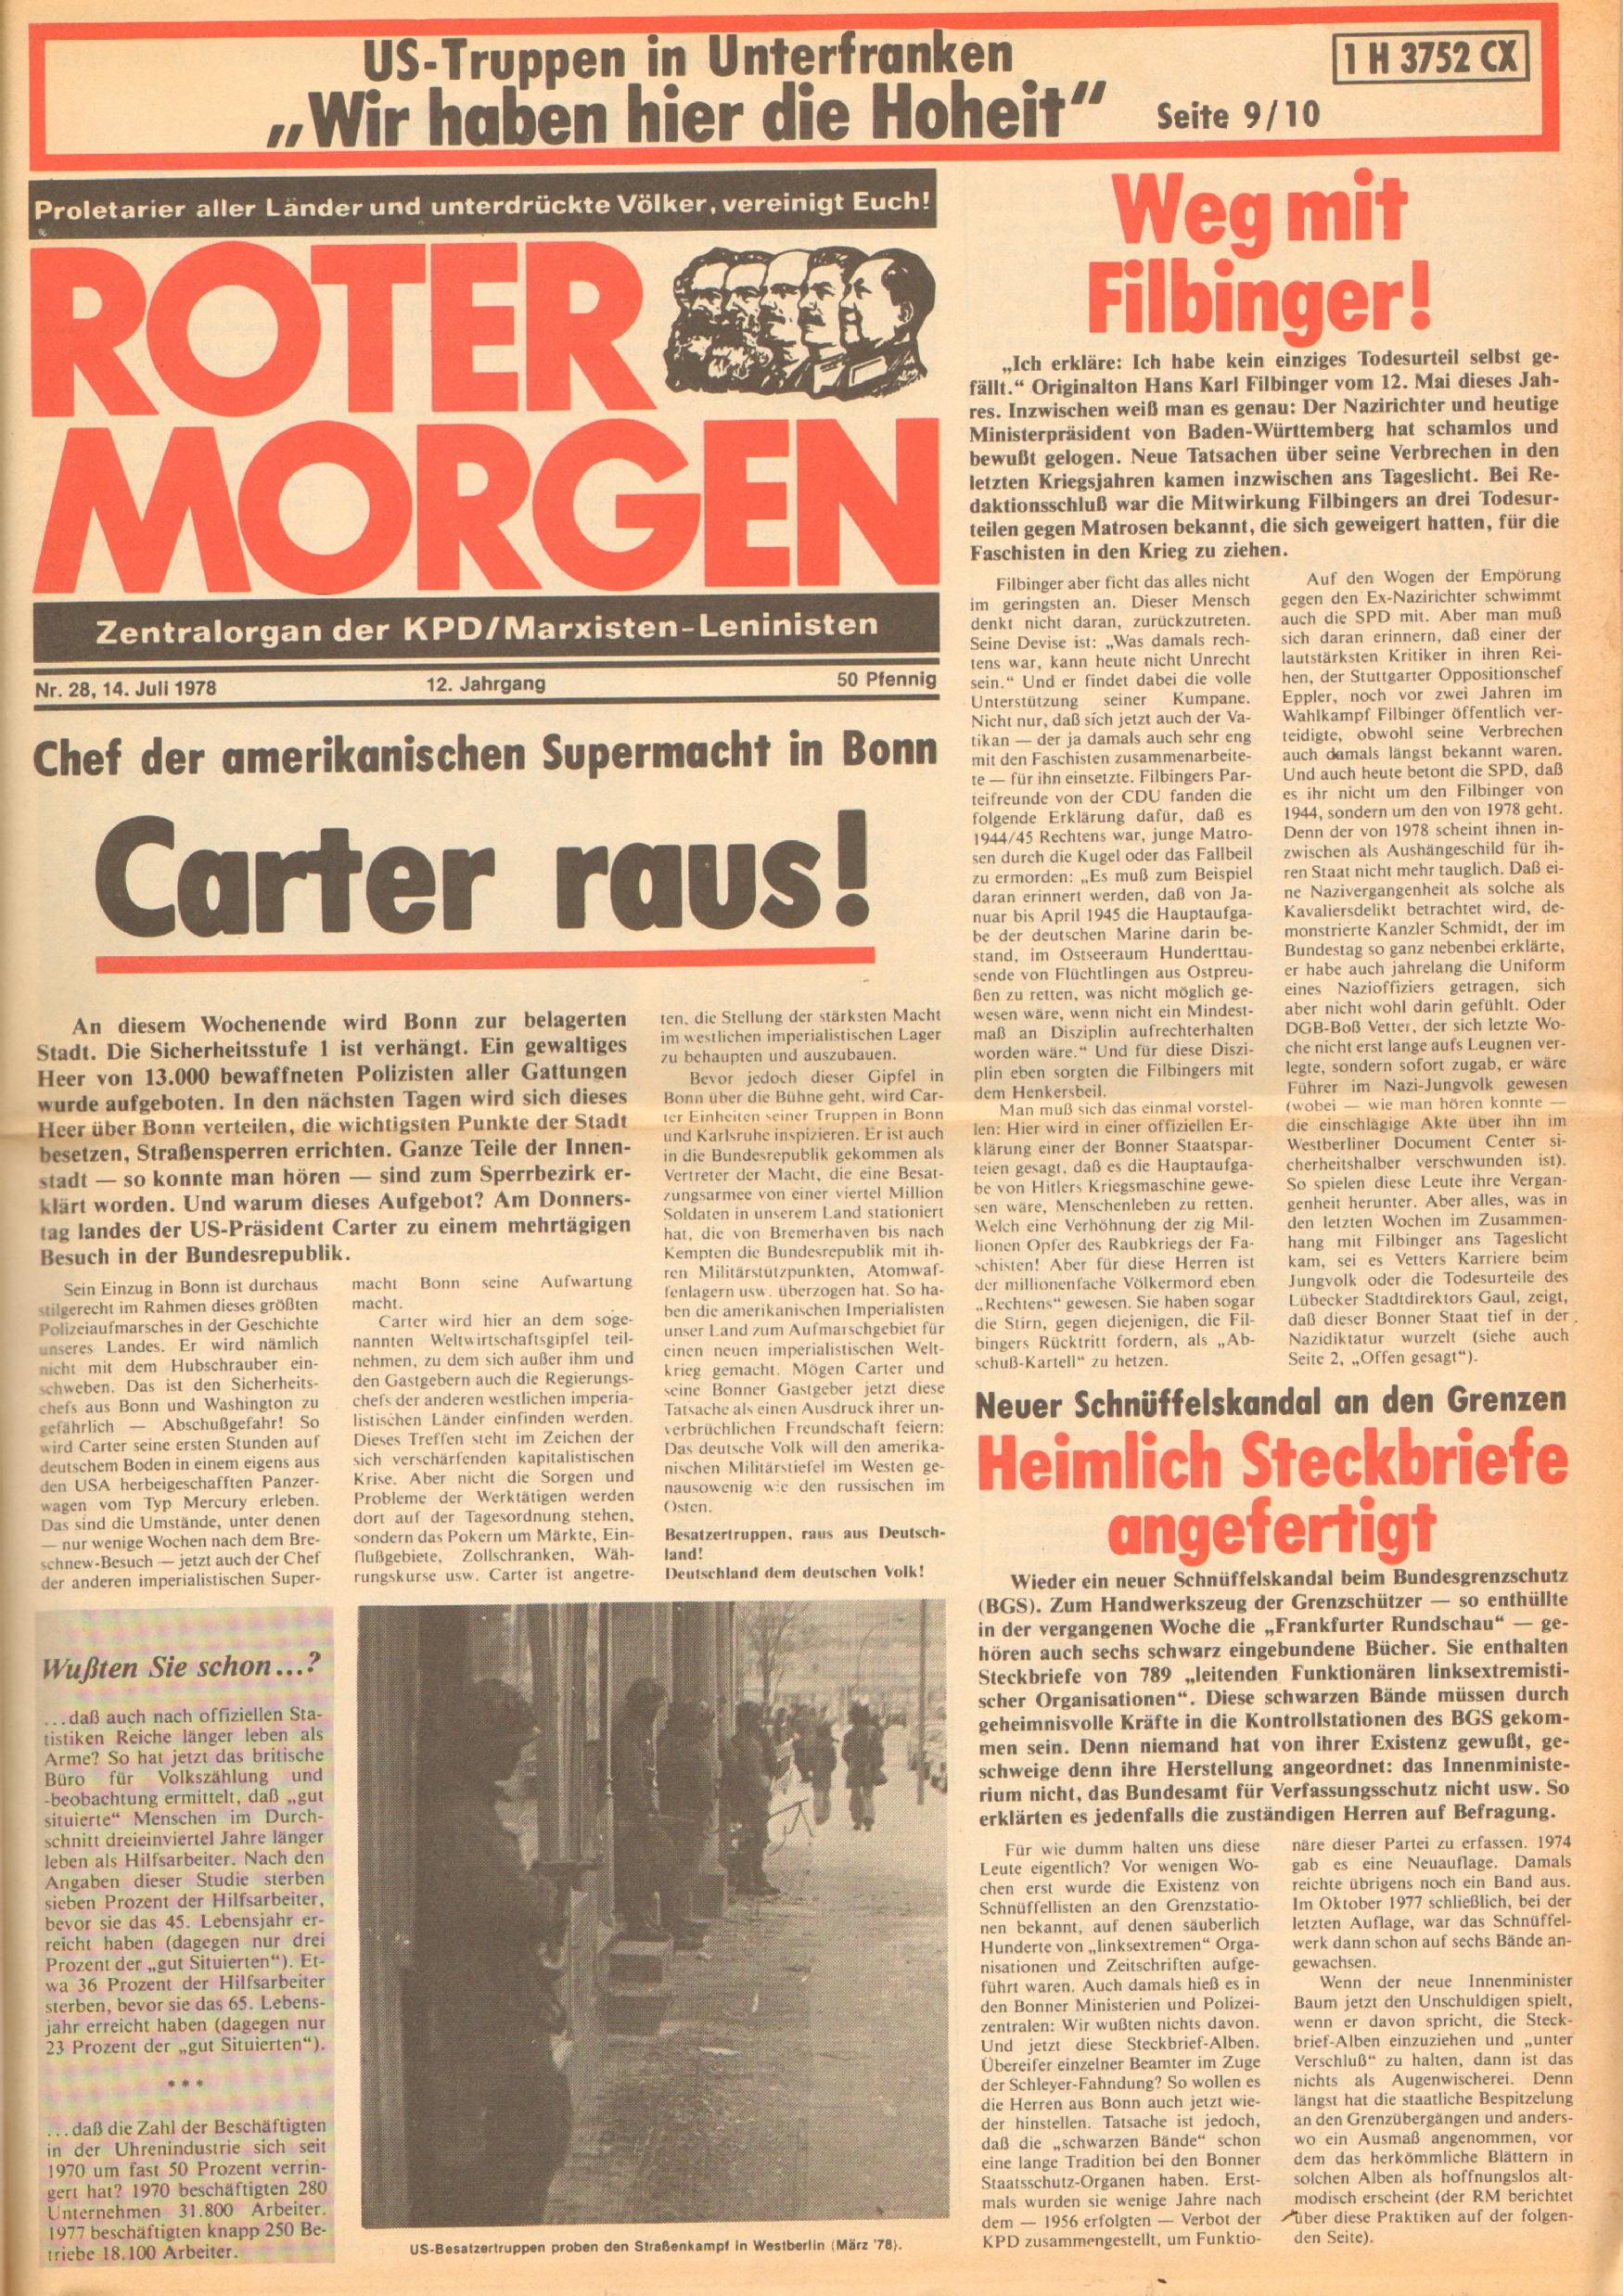 Roter Morgen, 12. Jg., 16. Juli 1978, Nr. 28, Seite 1